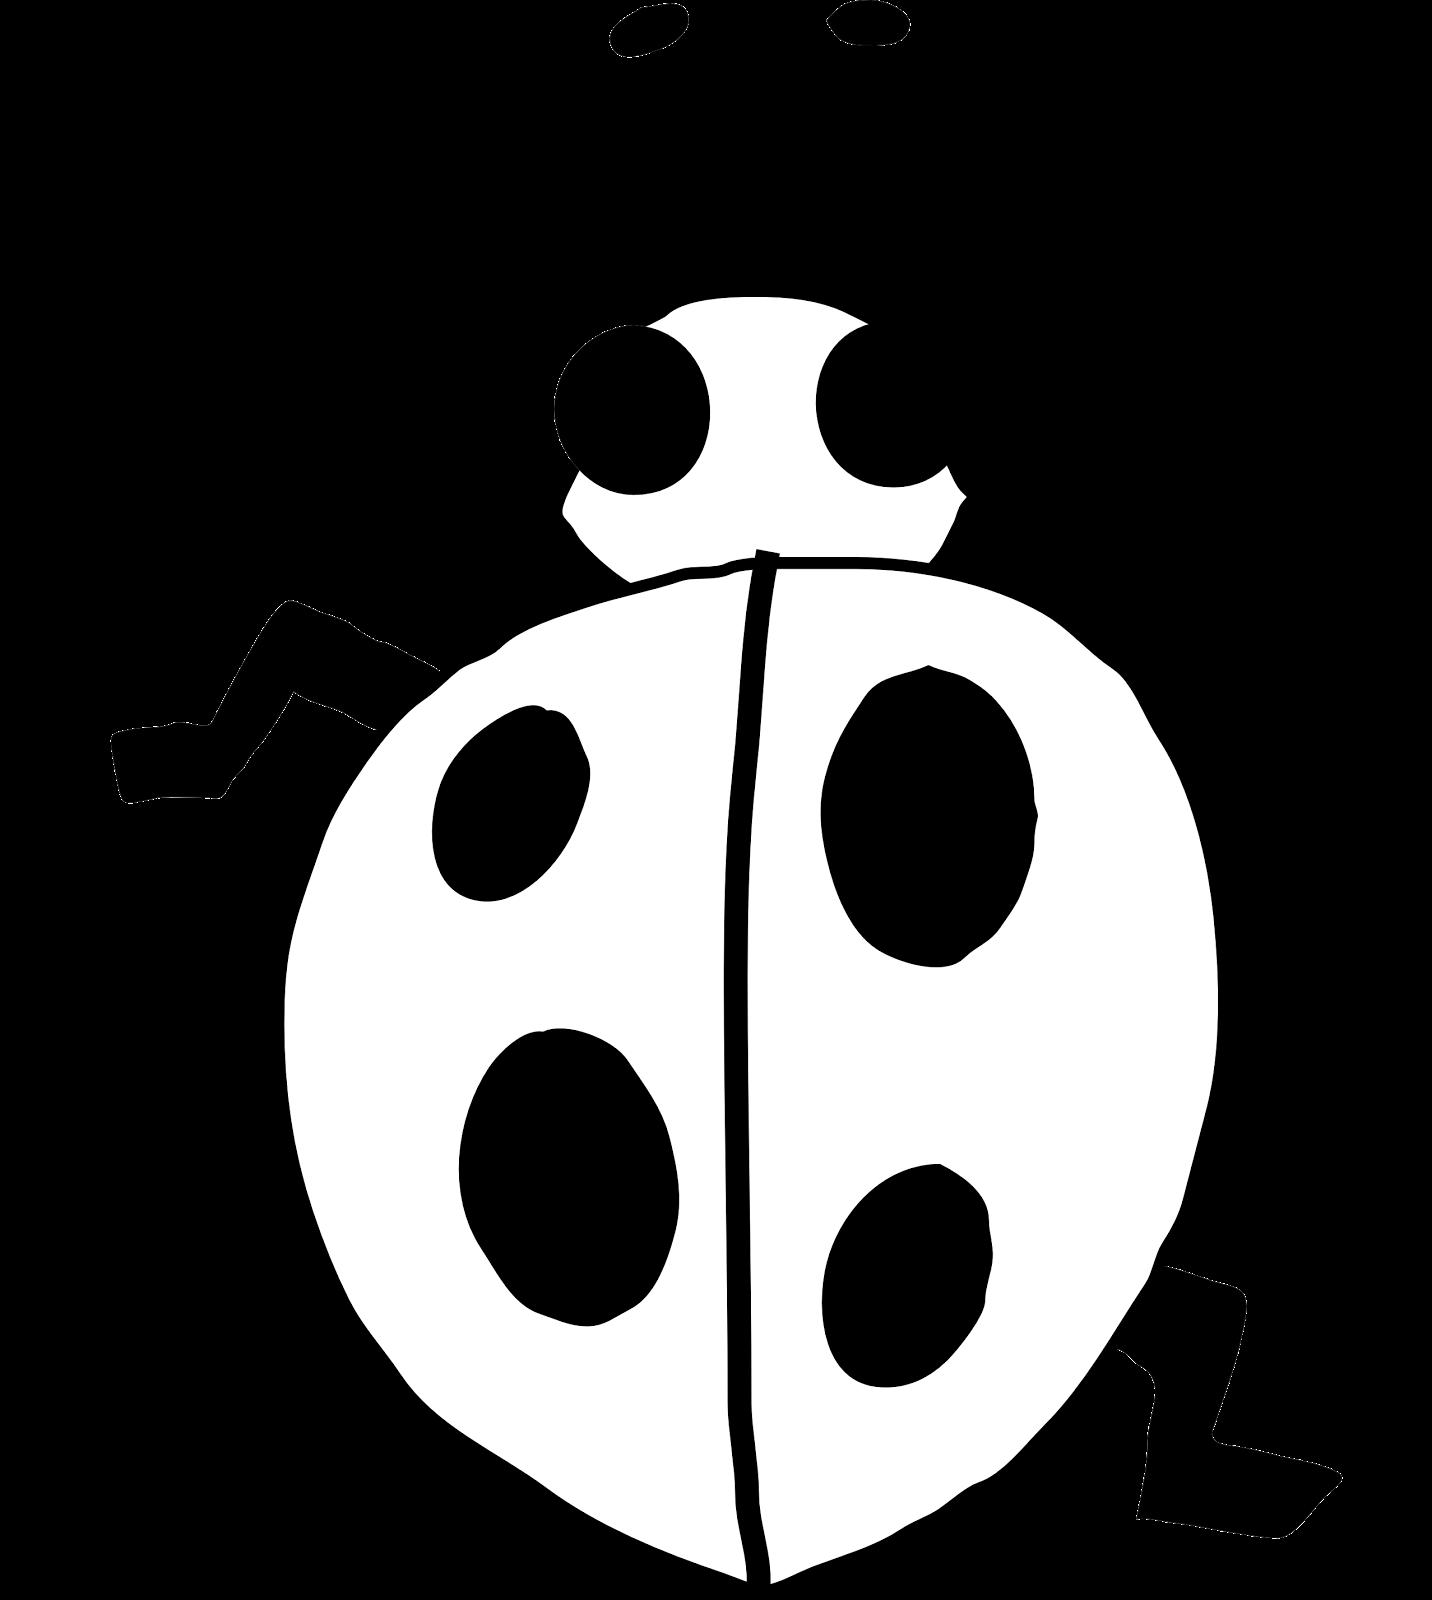 Ladybug clipart kindergarten. Outline line drawing painting